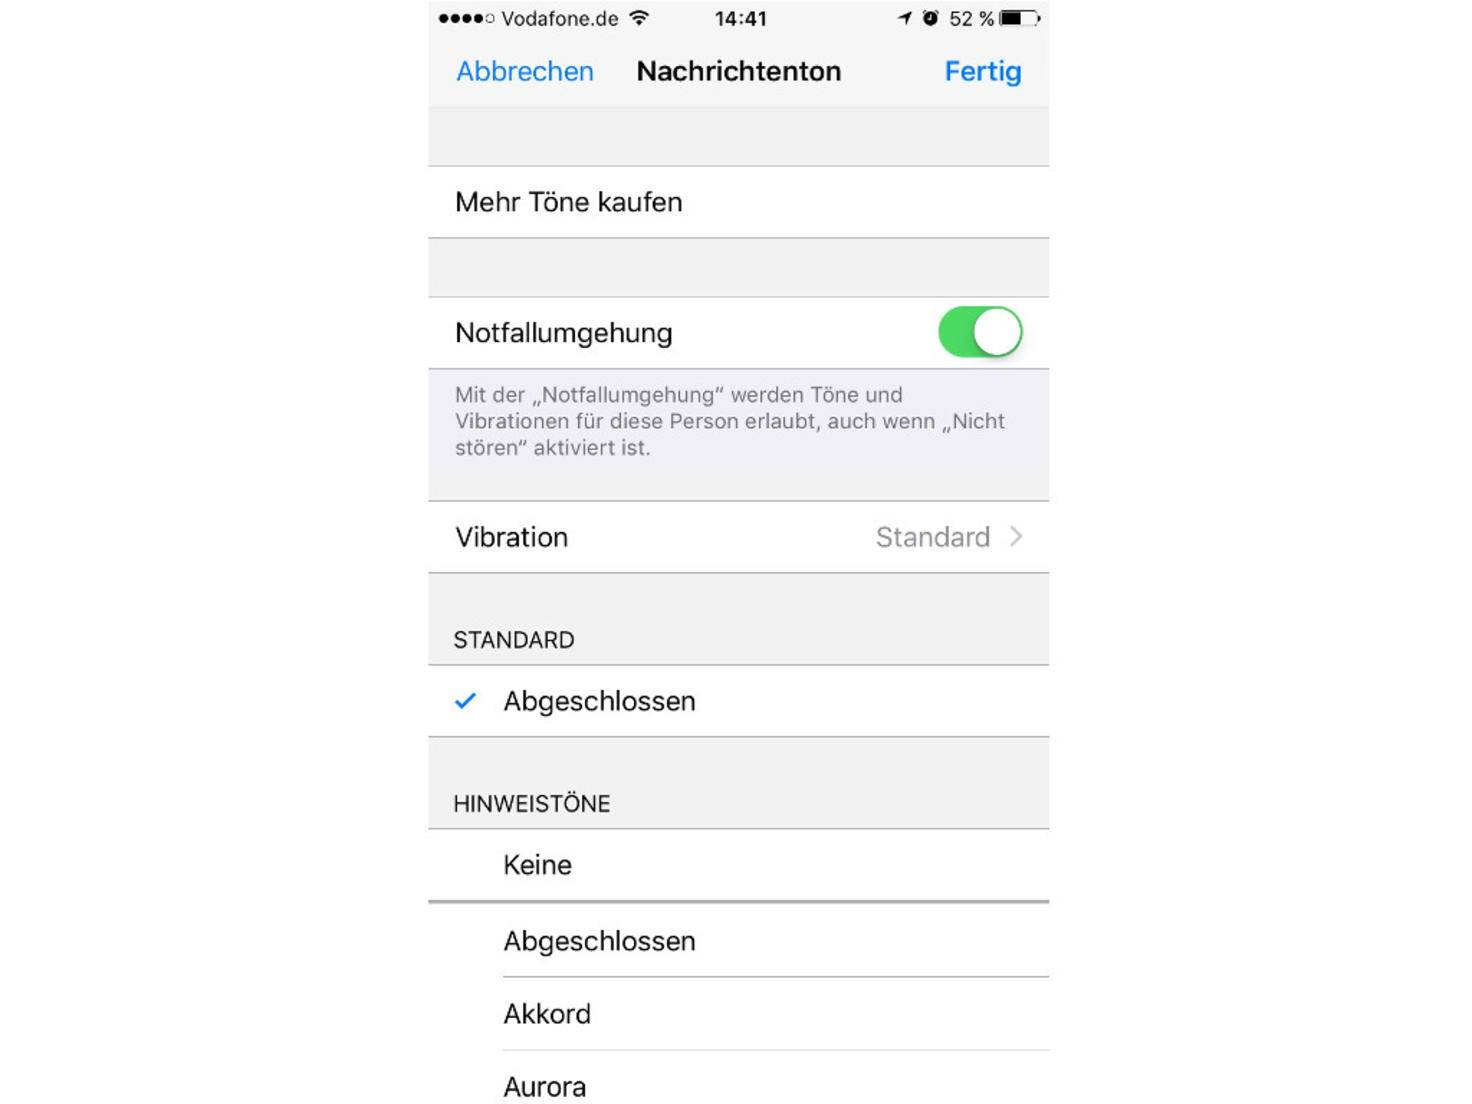 iOS Nicht stören Notfallumgehung